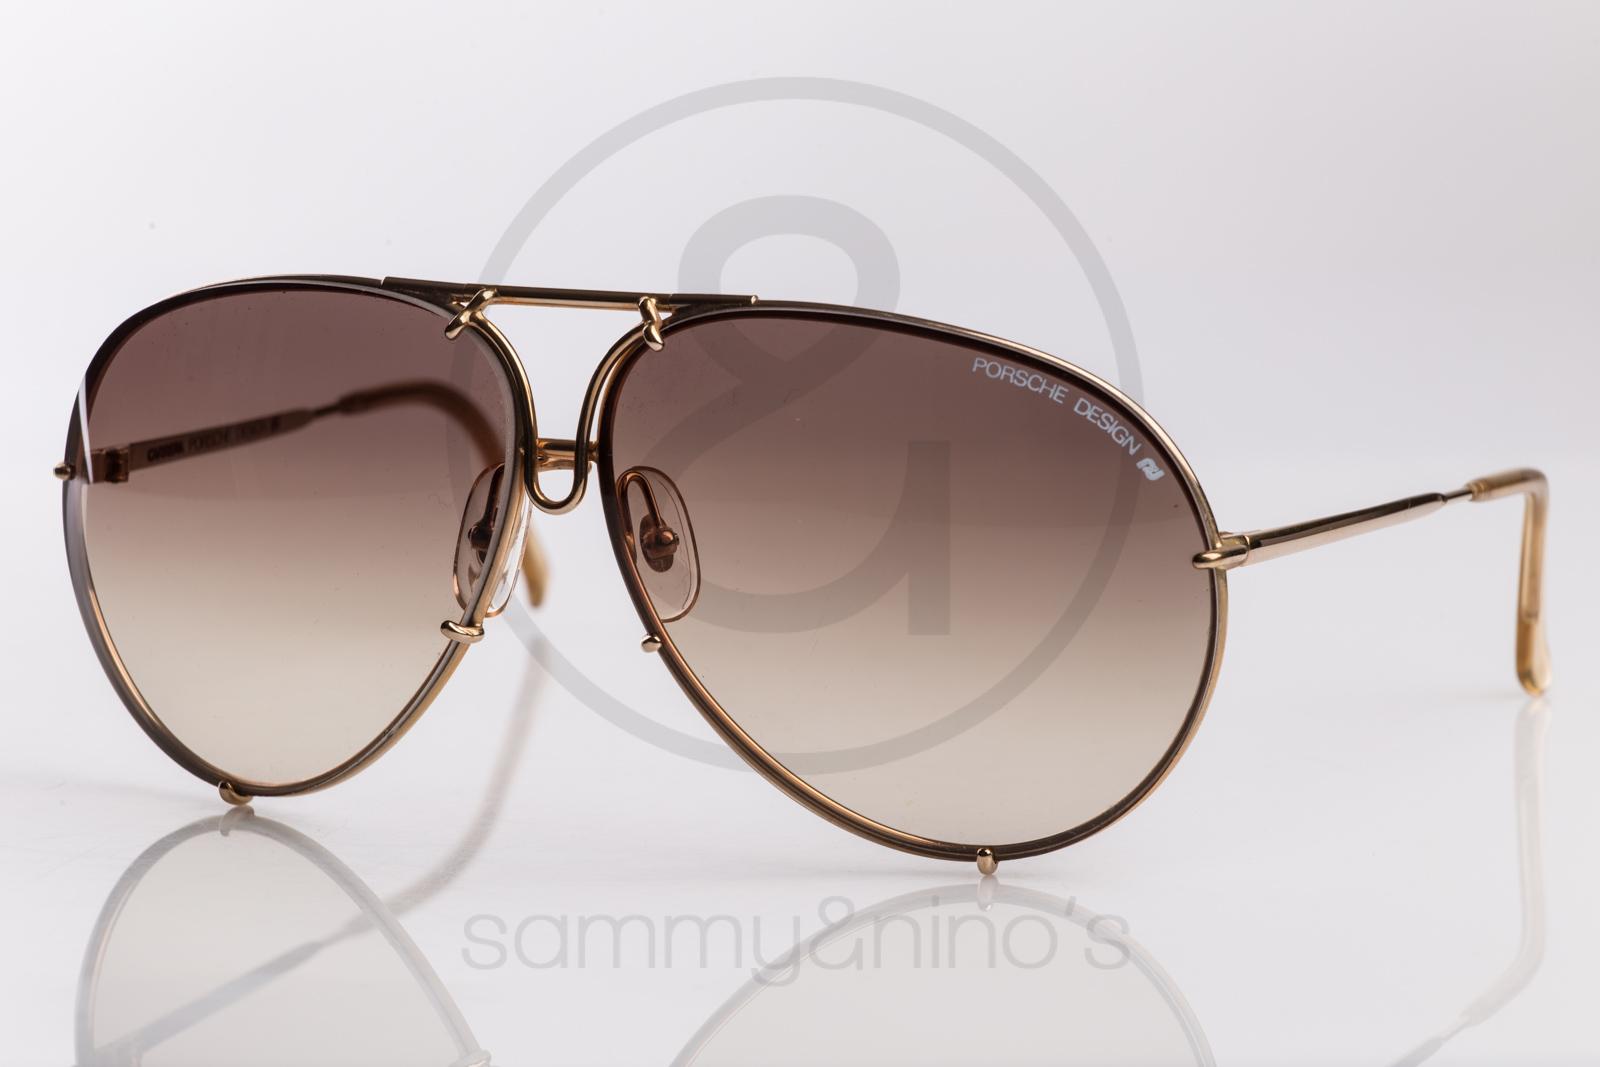 192006e994 Porsche Carrera Sunglasses Aviator 5623 « One More Soul